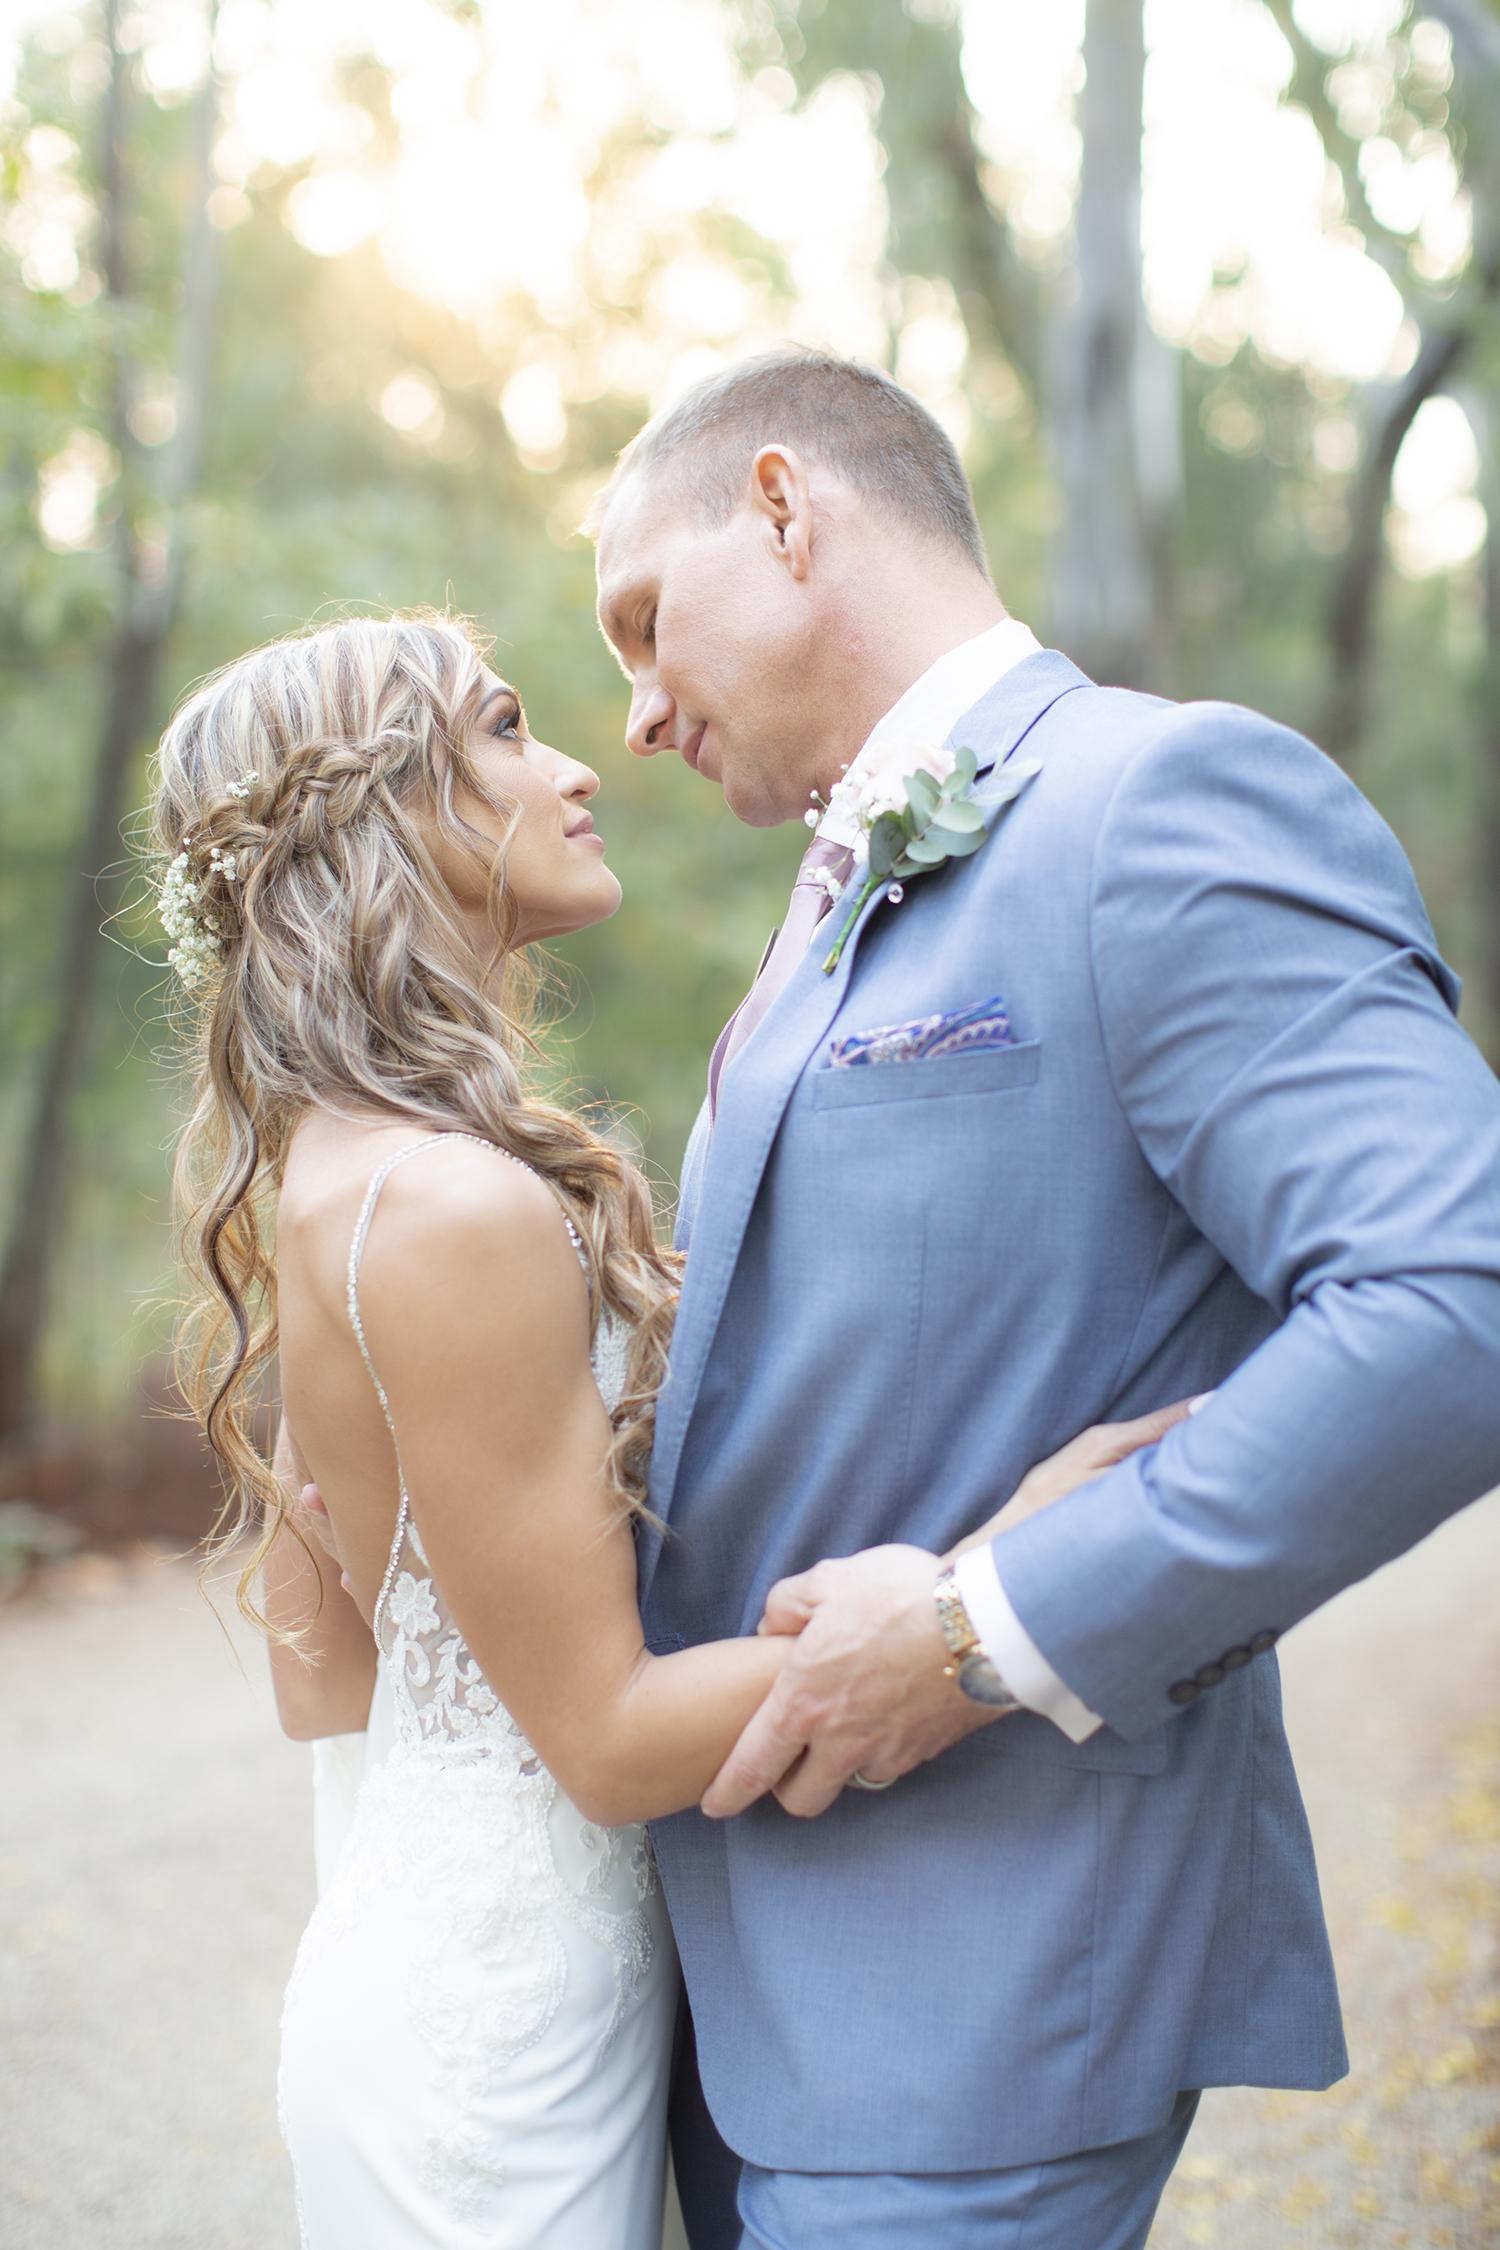 Neil & Bernice - Stunning Fine-art Classic Wedding